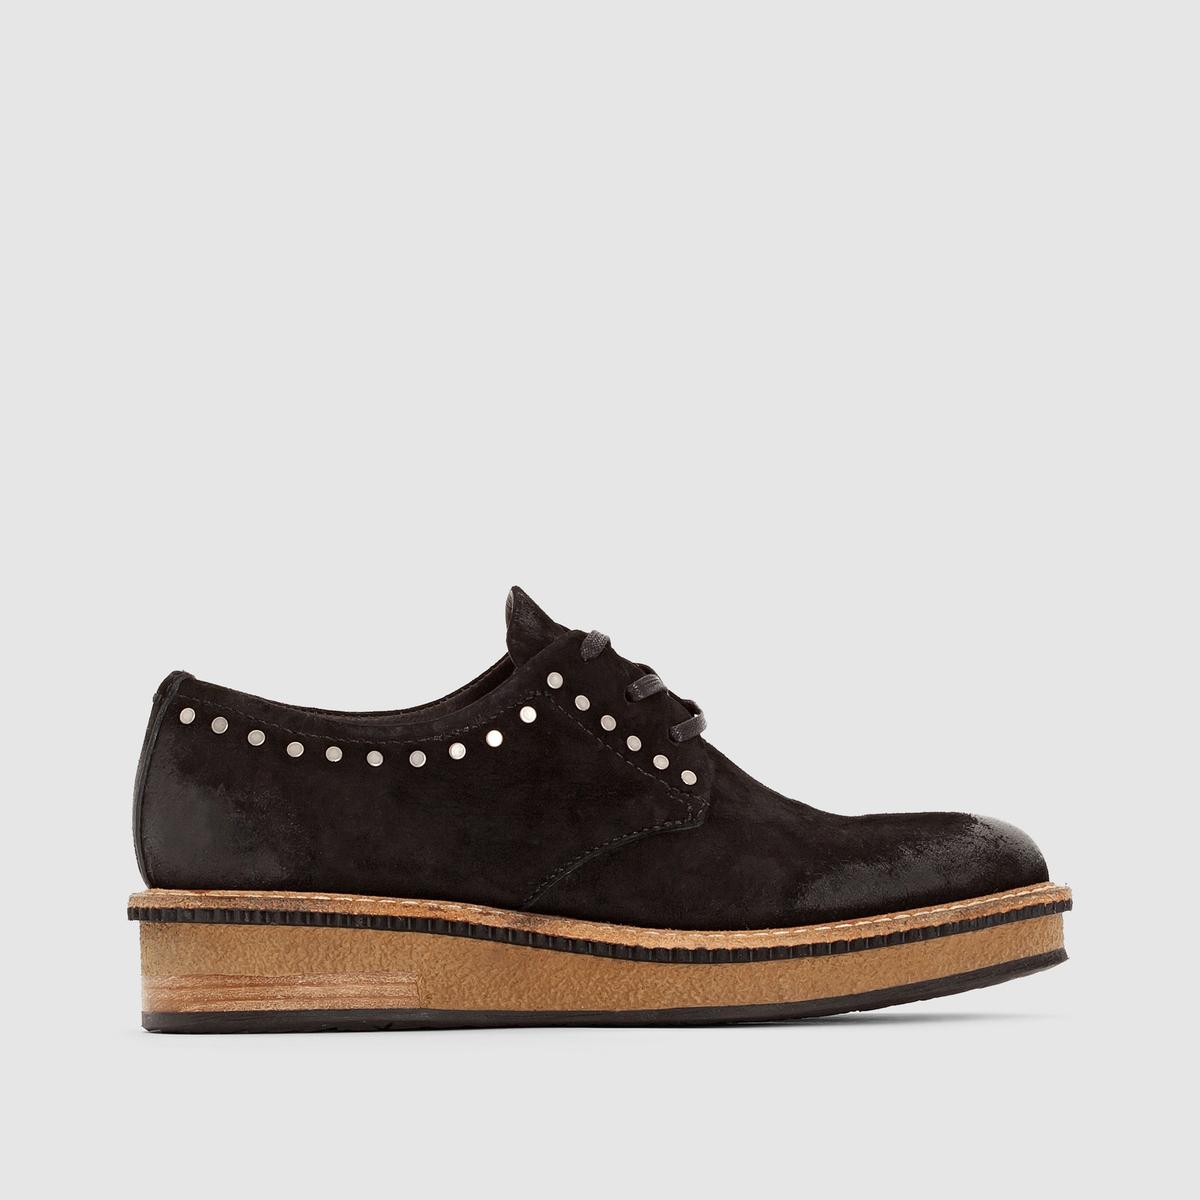 Ботинки-дерби кожаные MJUS CAVIAR